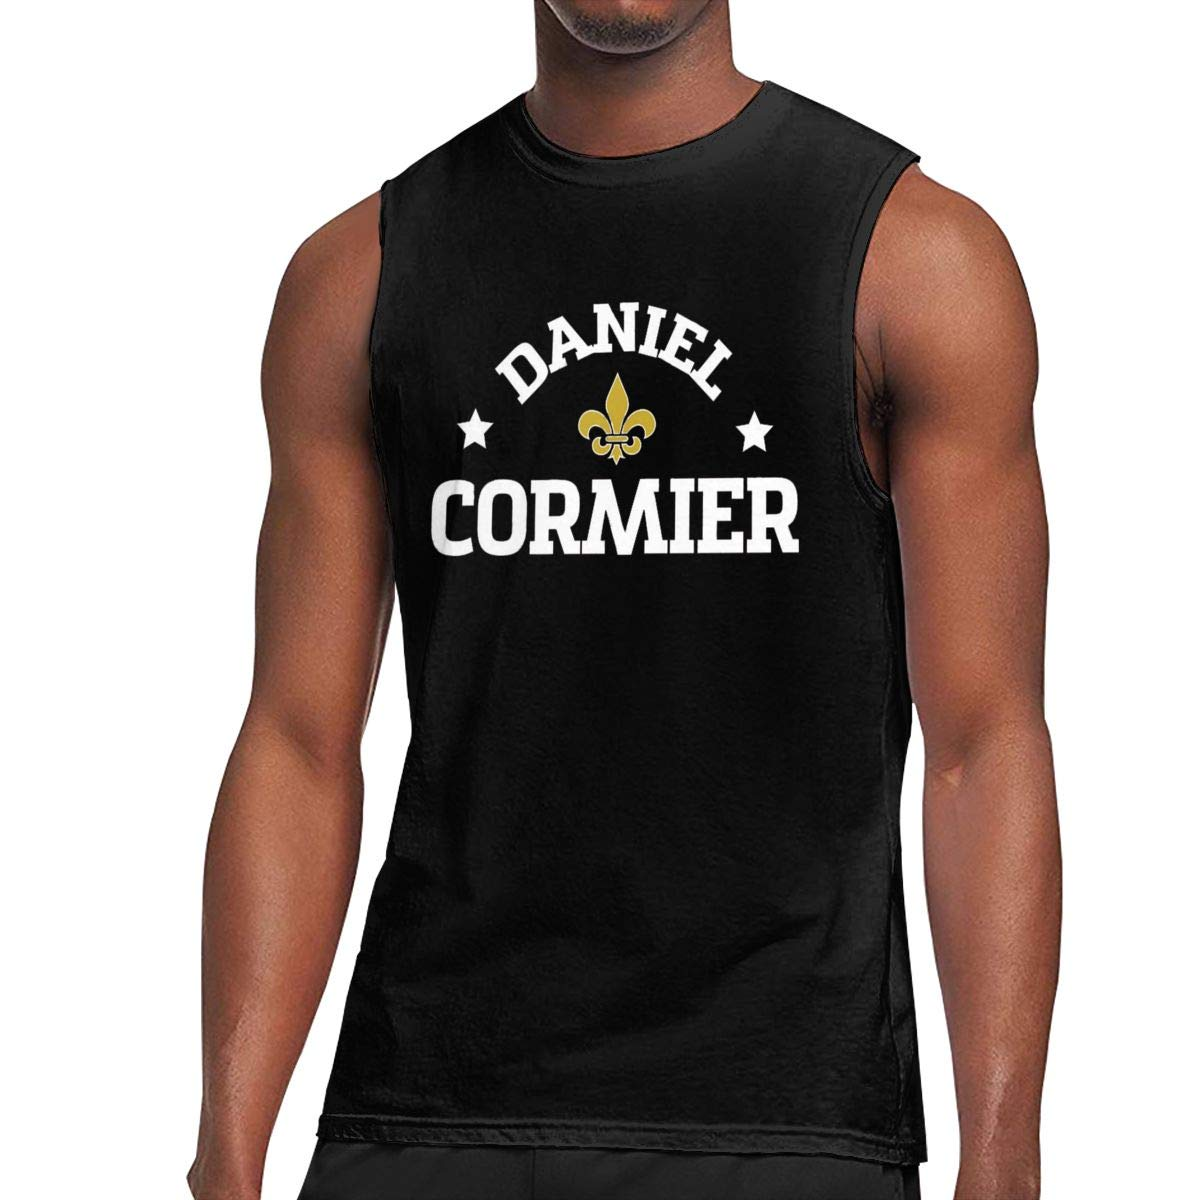 Nanakang Daniel Cormier S Round Neck Summer Sport Tank Tops Sleeveless Tees Ness Black Shirts